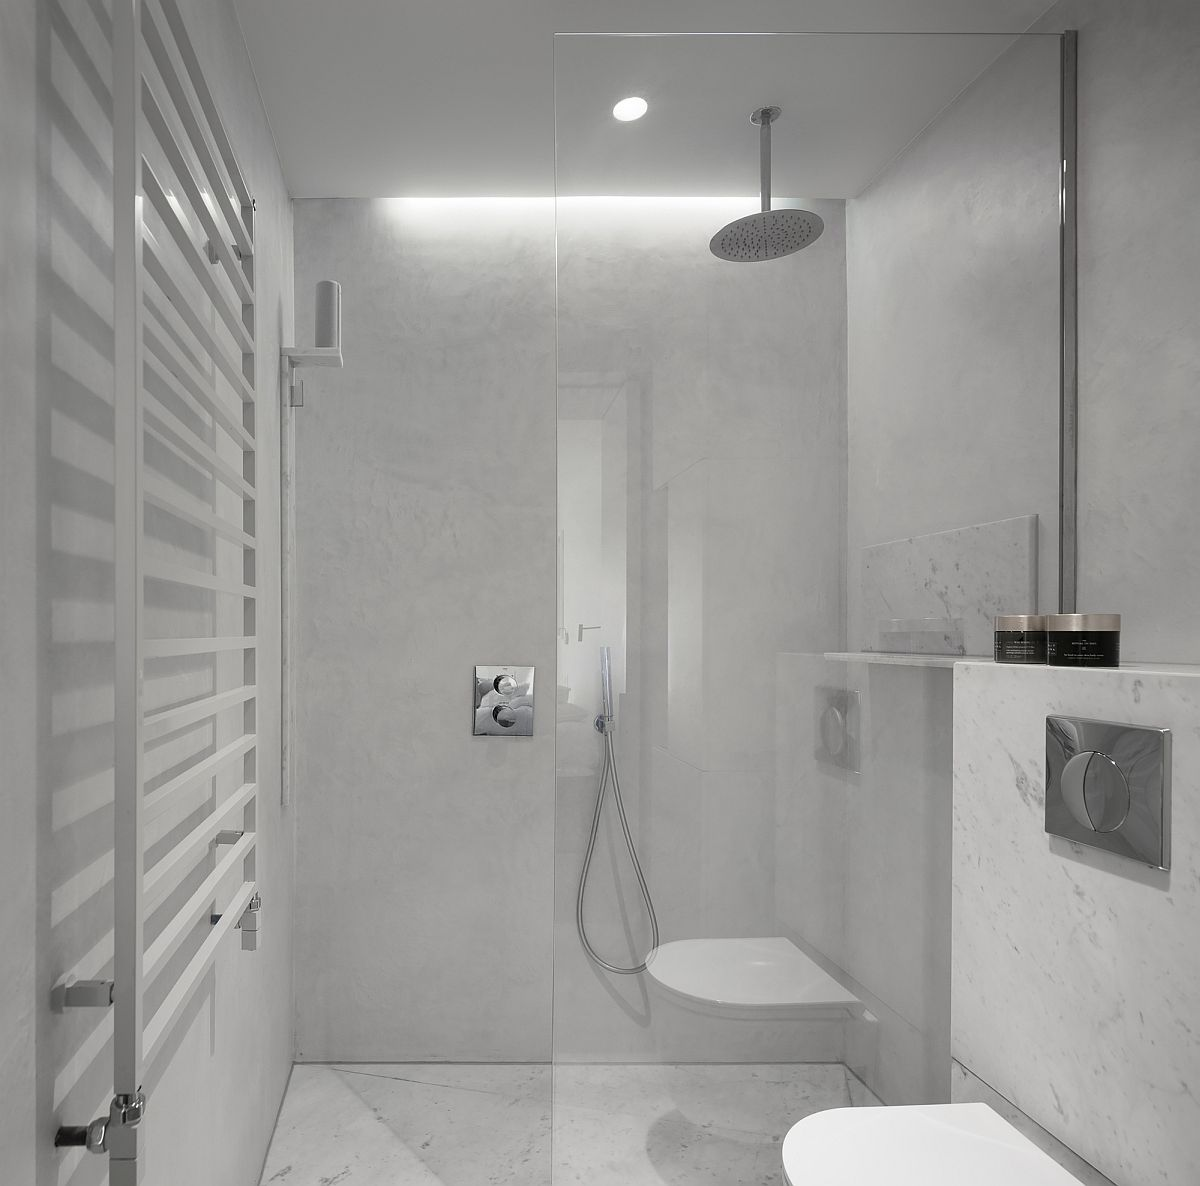 Carrara-marble-and-concrete-create-a-snazzy-modern-minimal-bathroom-79271